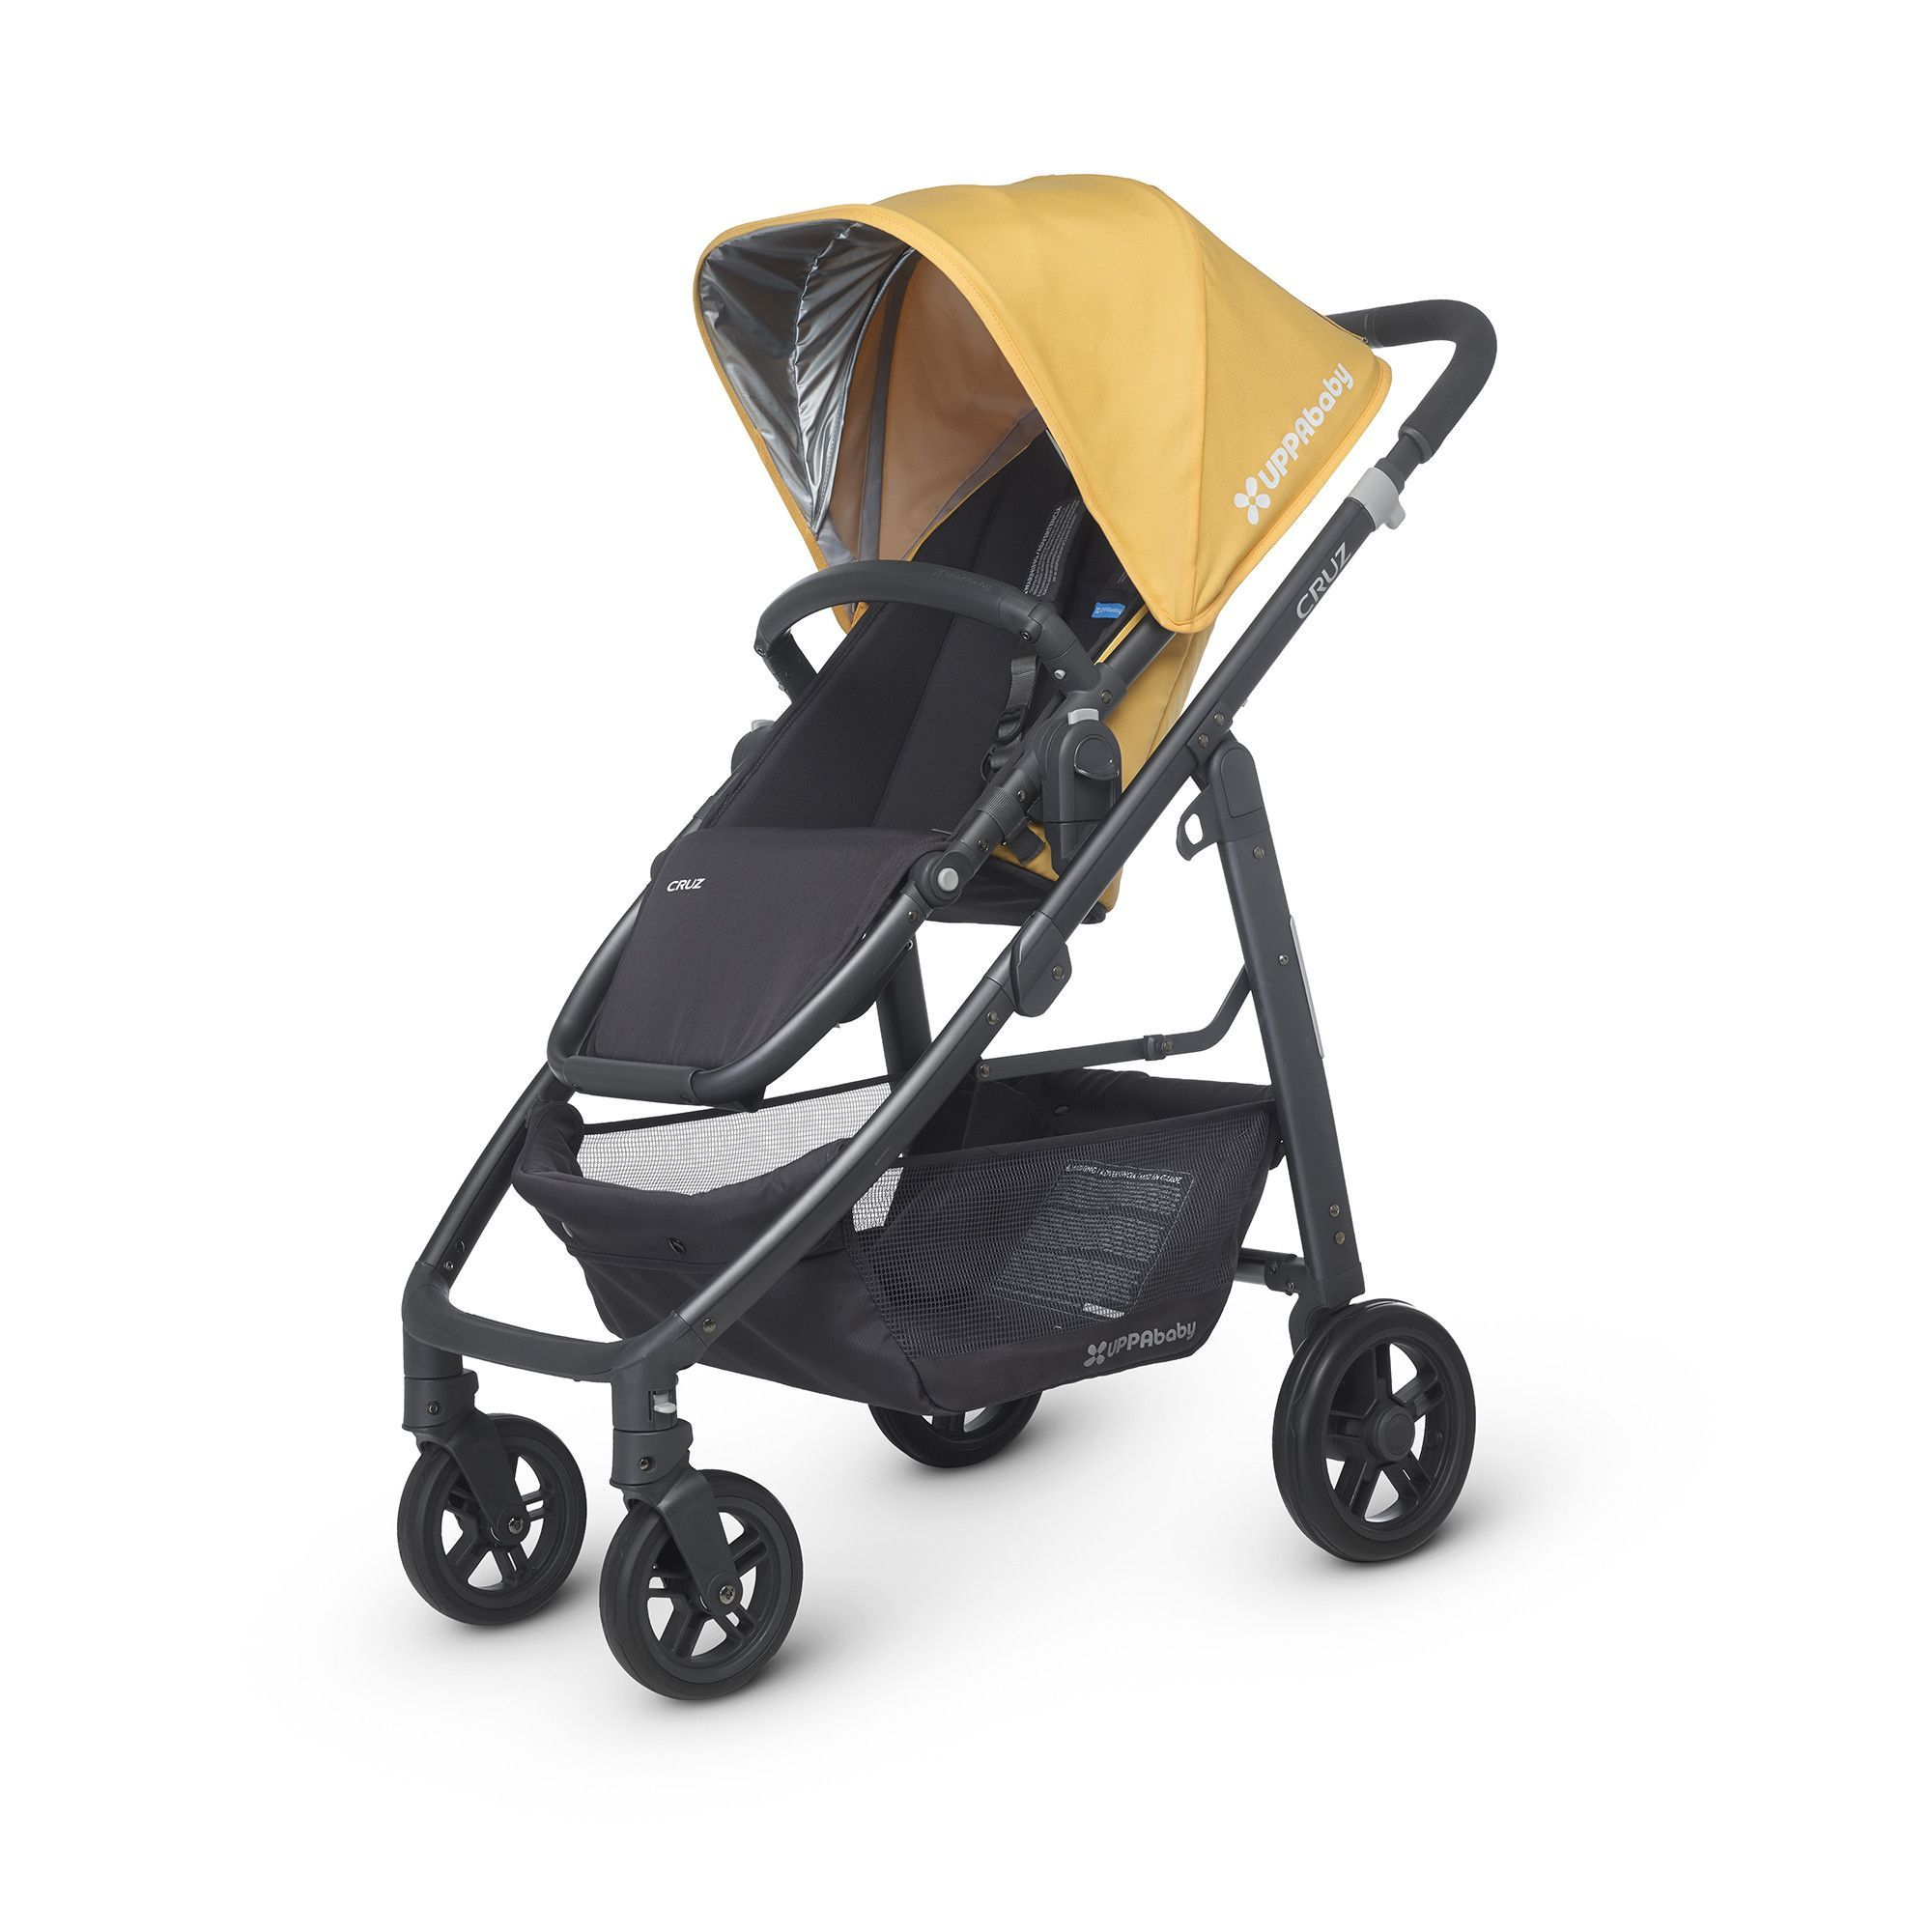 2020 UPPAbaby Cruz V2 Stroller Uppababy stroller